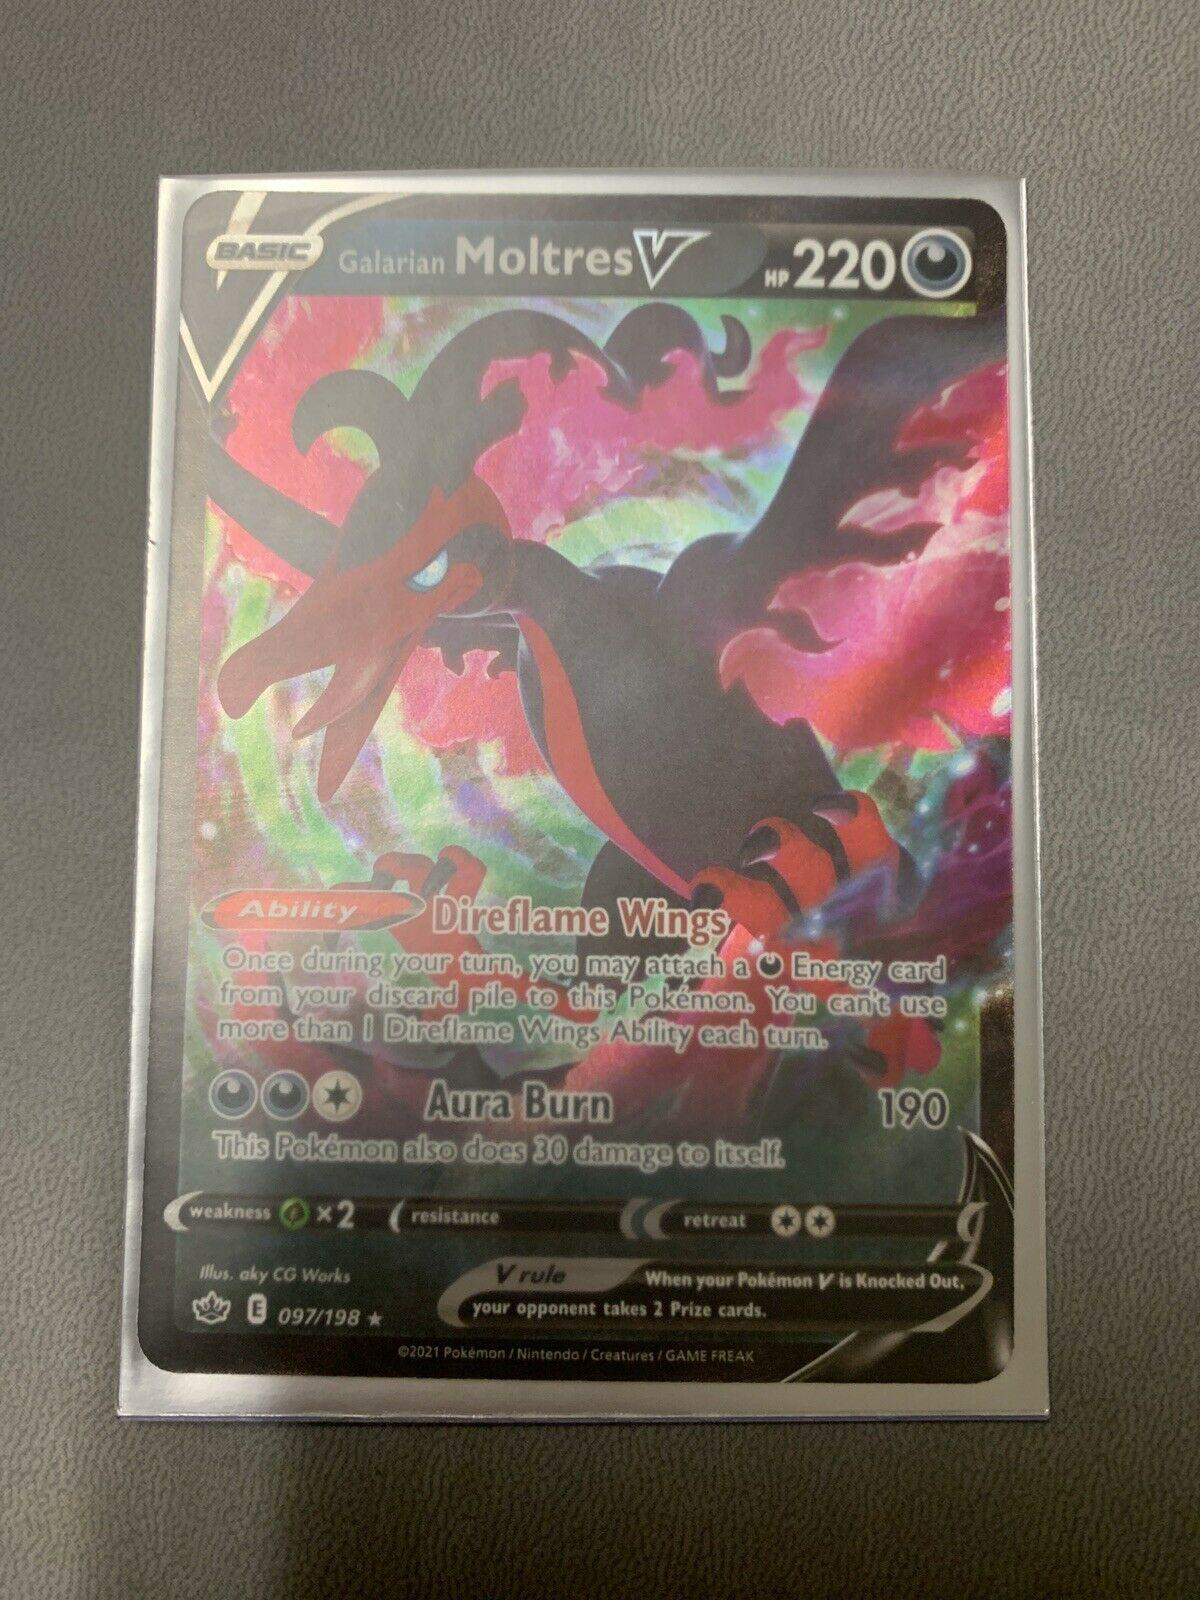 Galarian Moltres V 097/198 Holo Ultra Rare Chilling Reign Pokemon TCG FULL ART